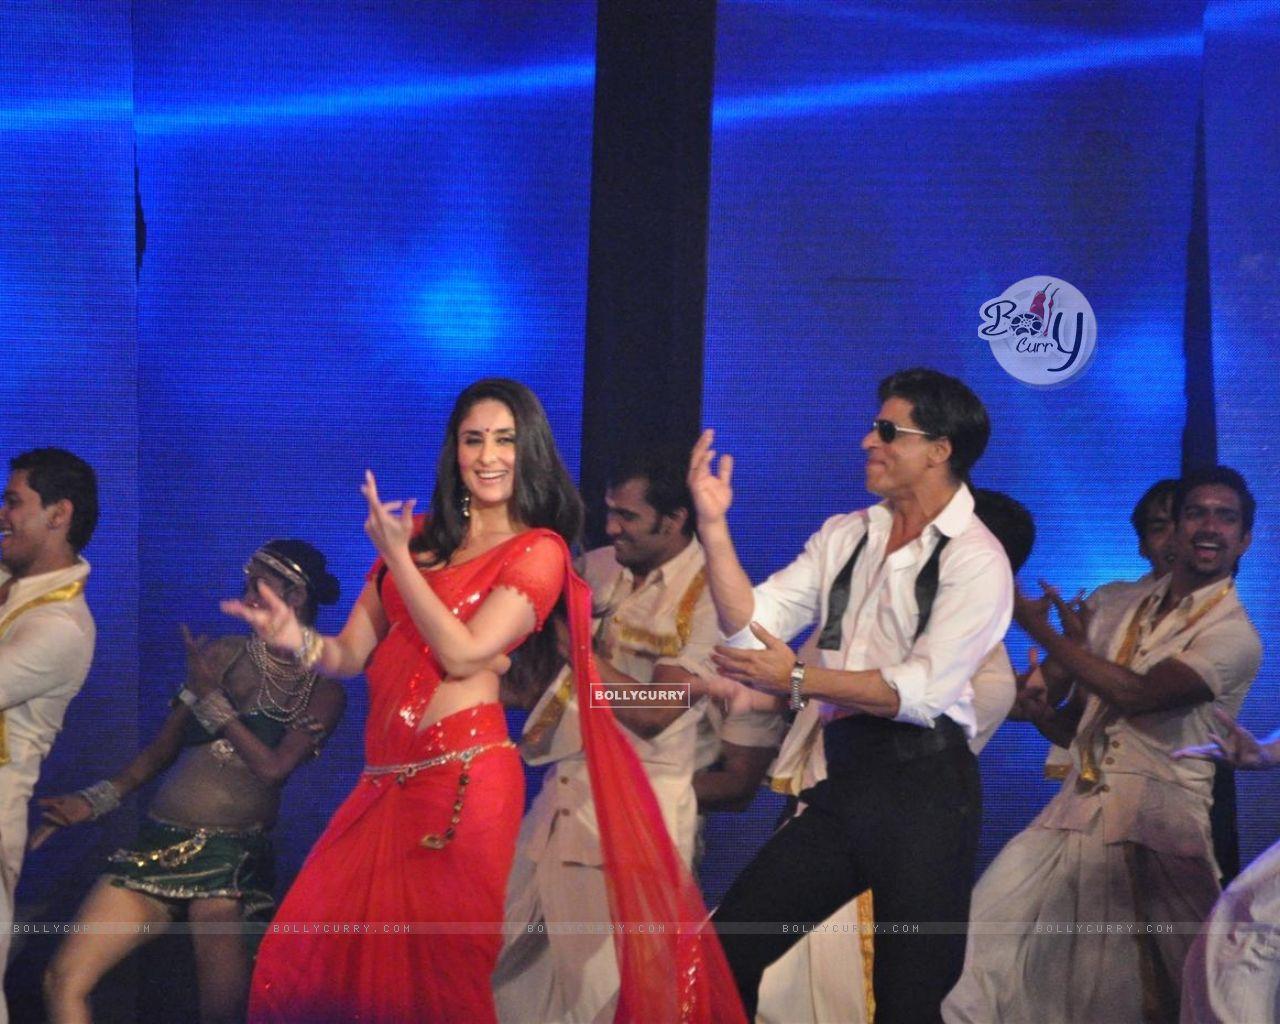 wallpaper - shah rukh khan and kareena kapoor shaking their legs on